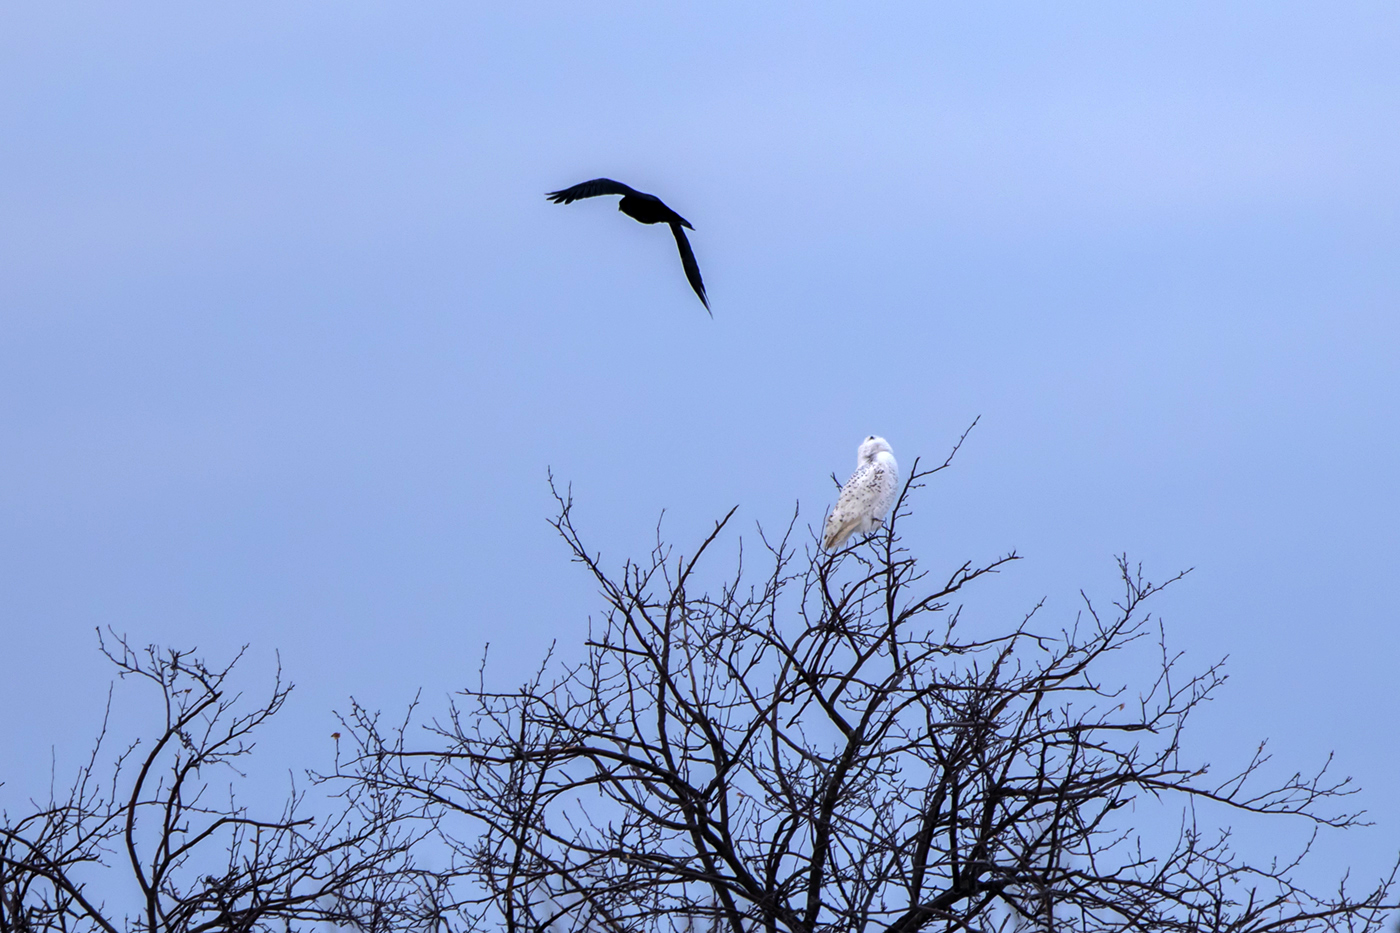 snowy-owl-crow-sunrise-new-brunswick-2-BRimages.ca